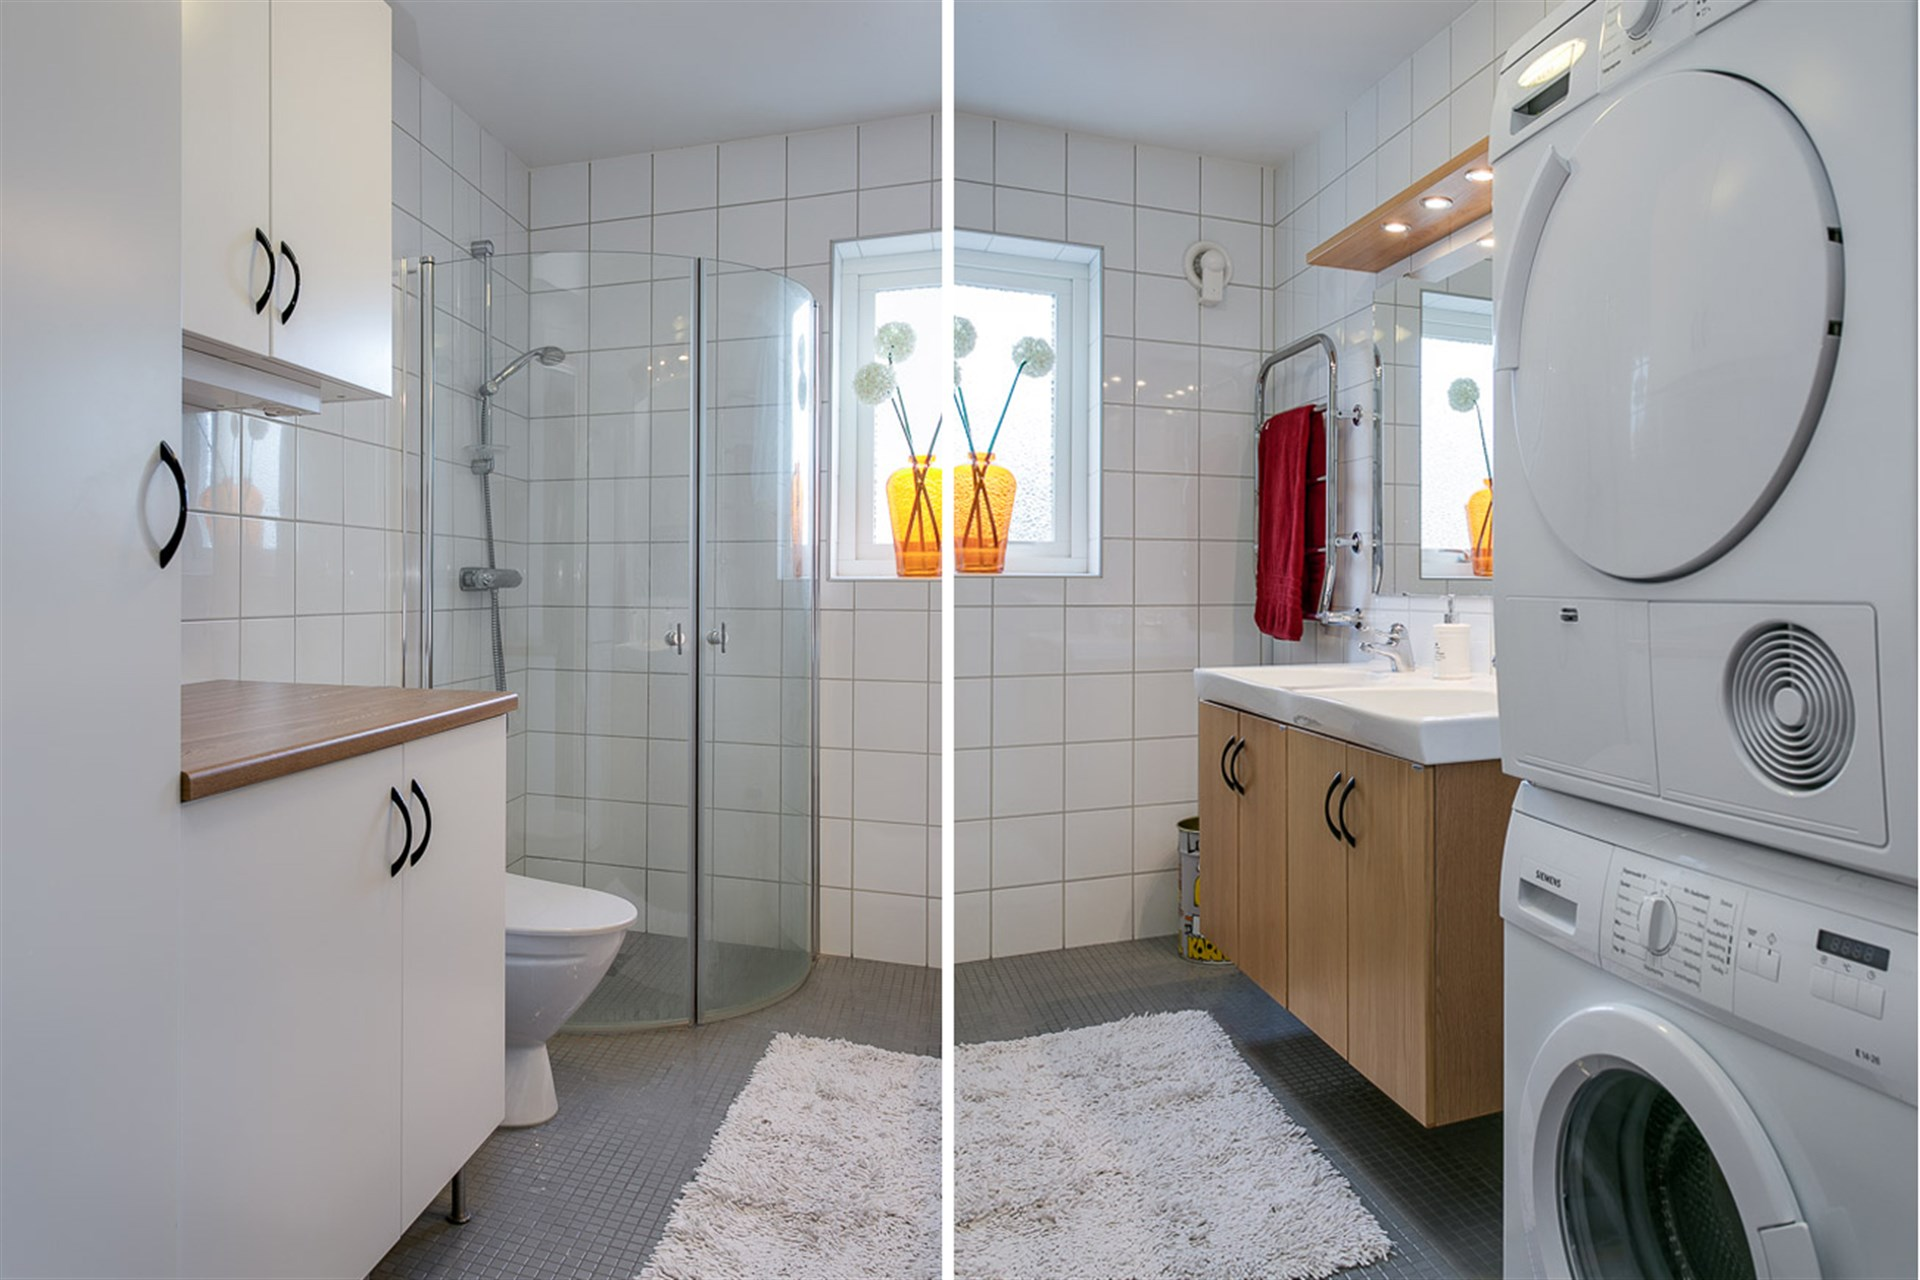 WC/dusch samt klädvård plan 1